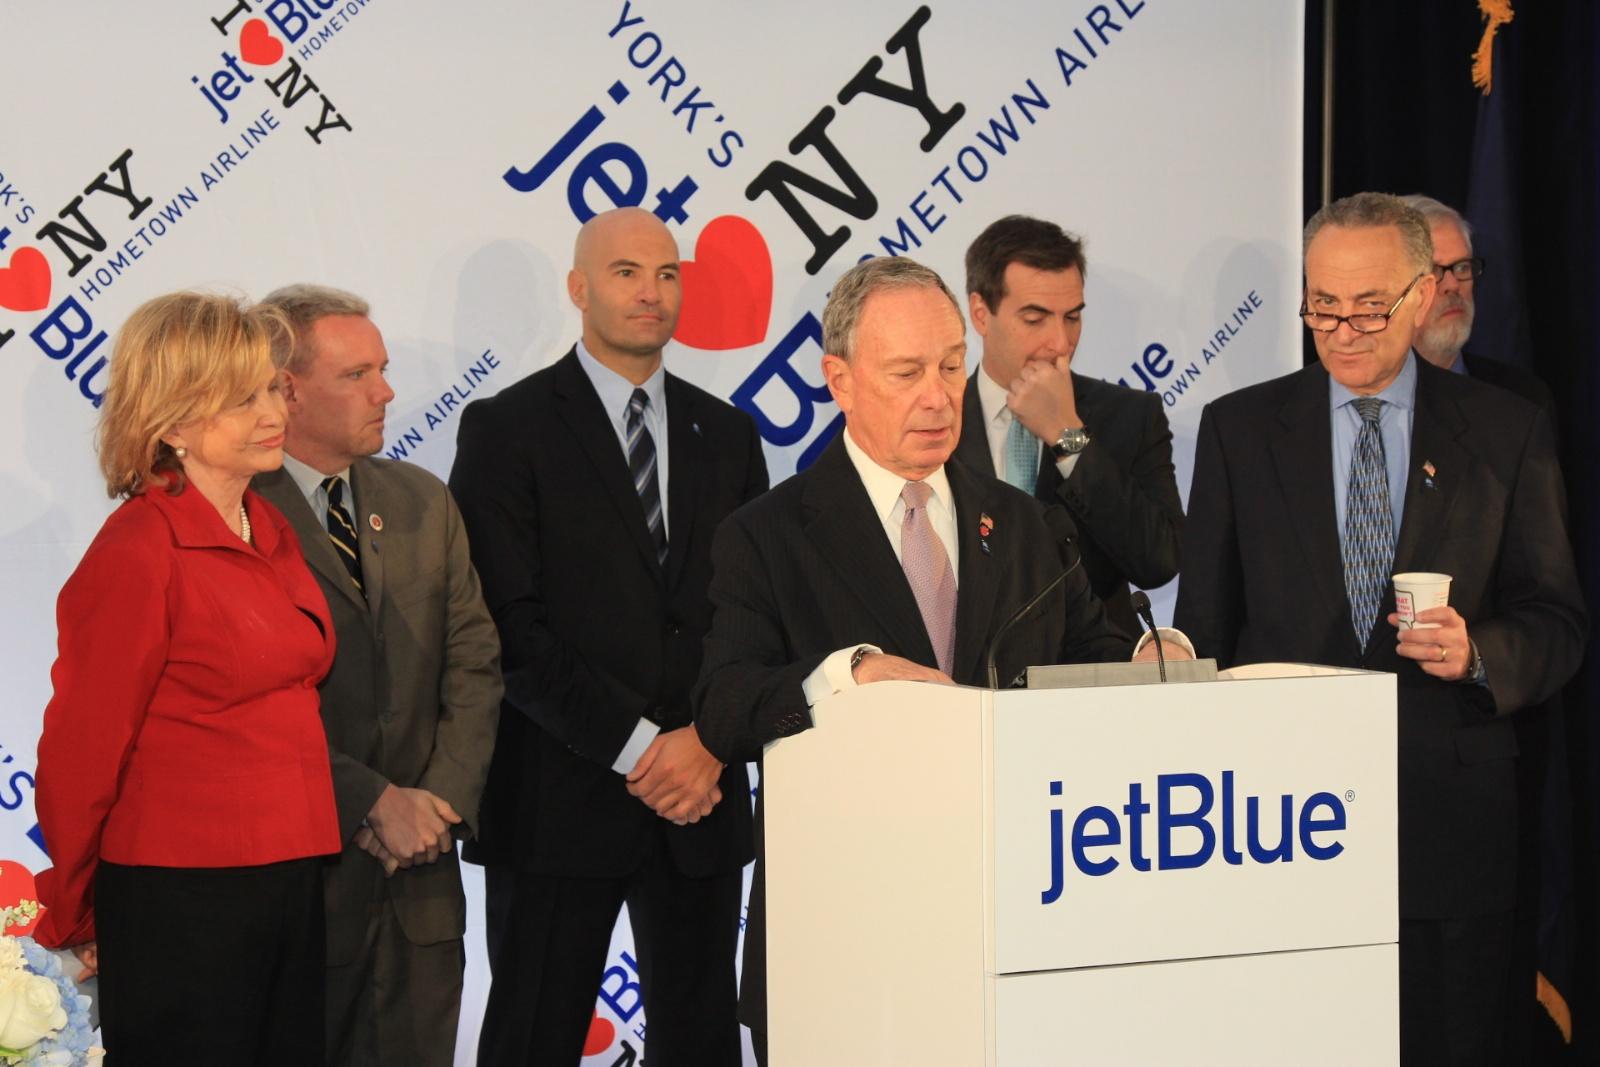 jetBlue LIC 2.jpg